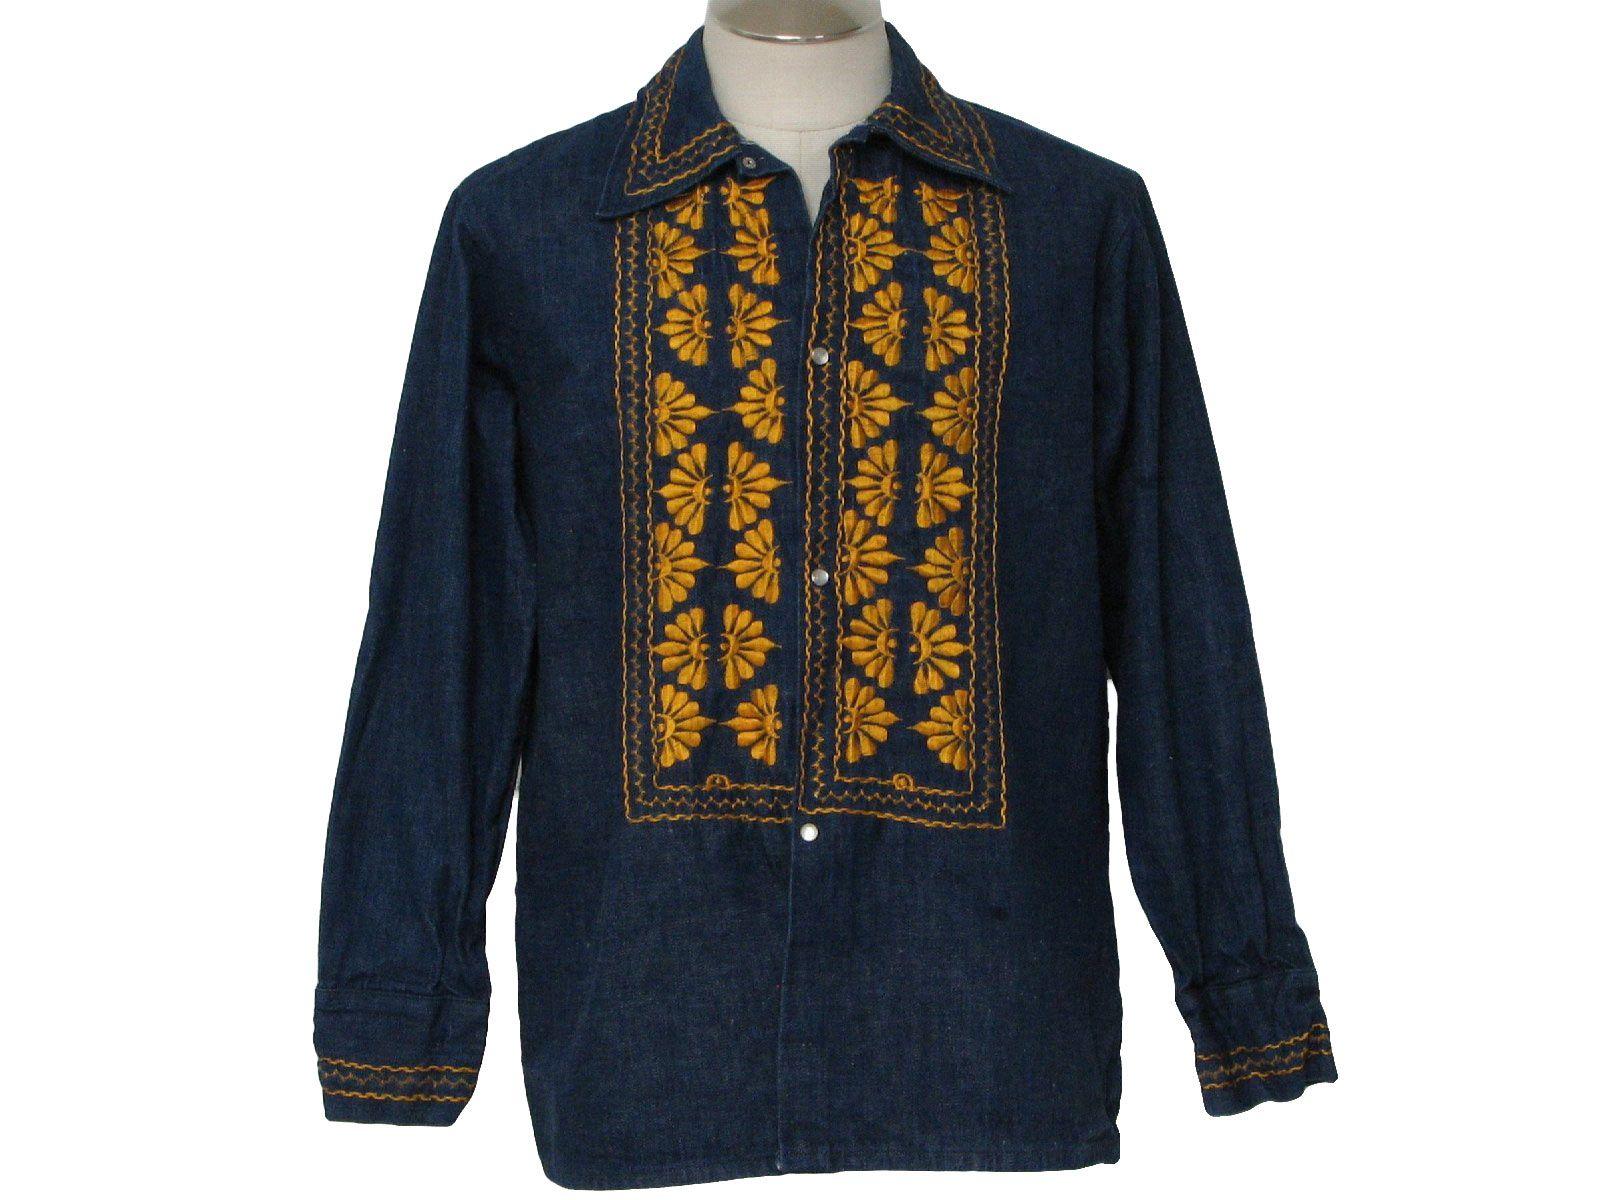 Men's Hippie shirt NykQ55rP8y